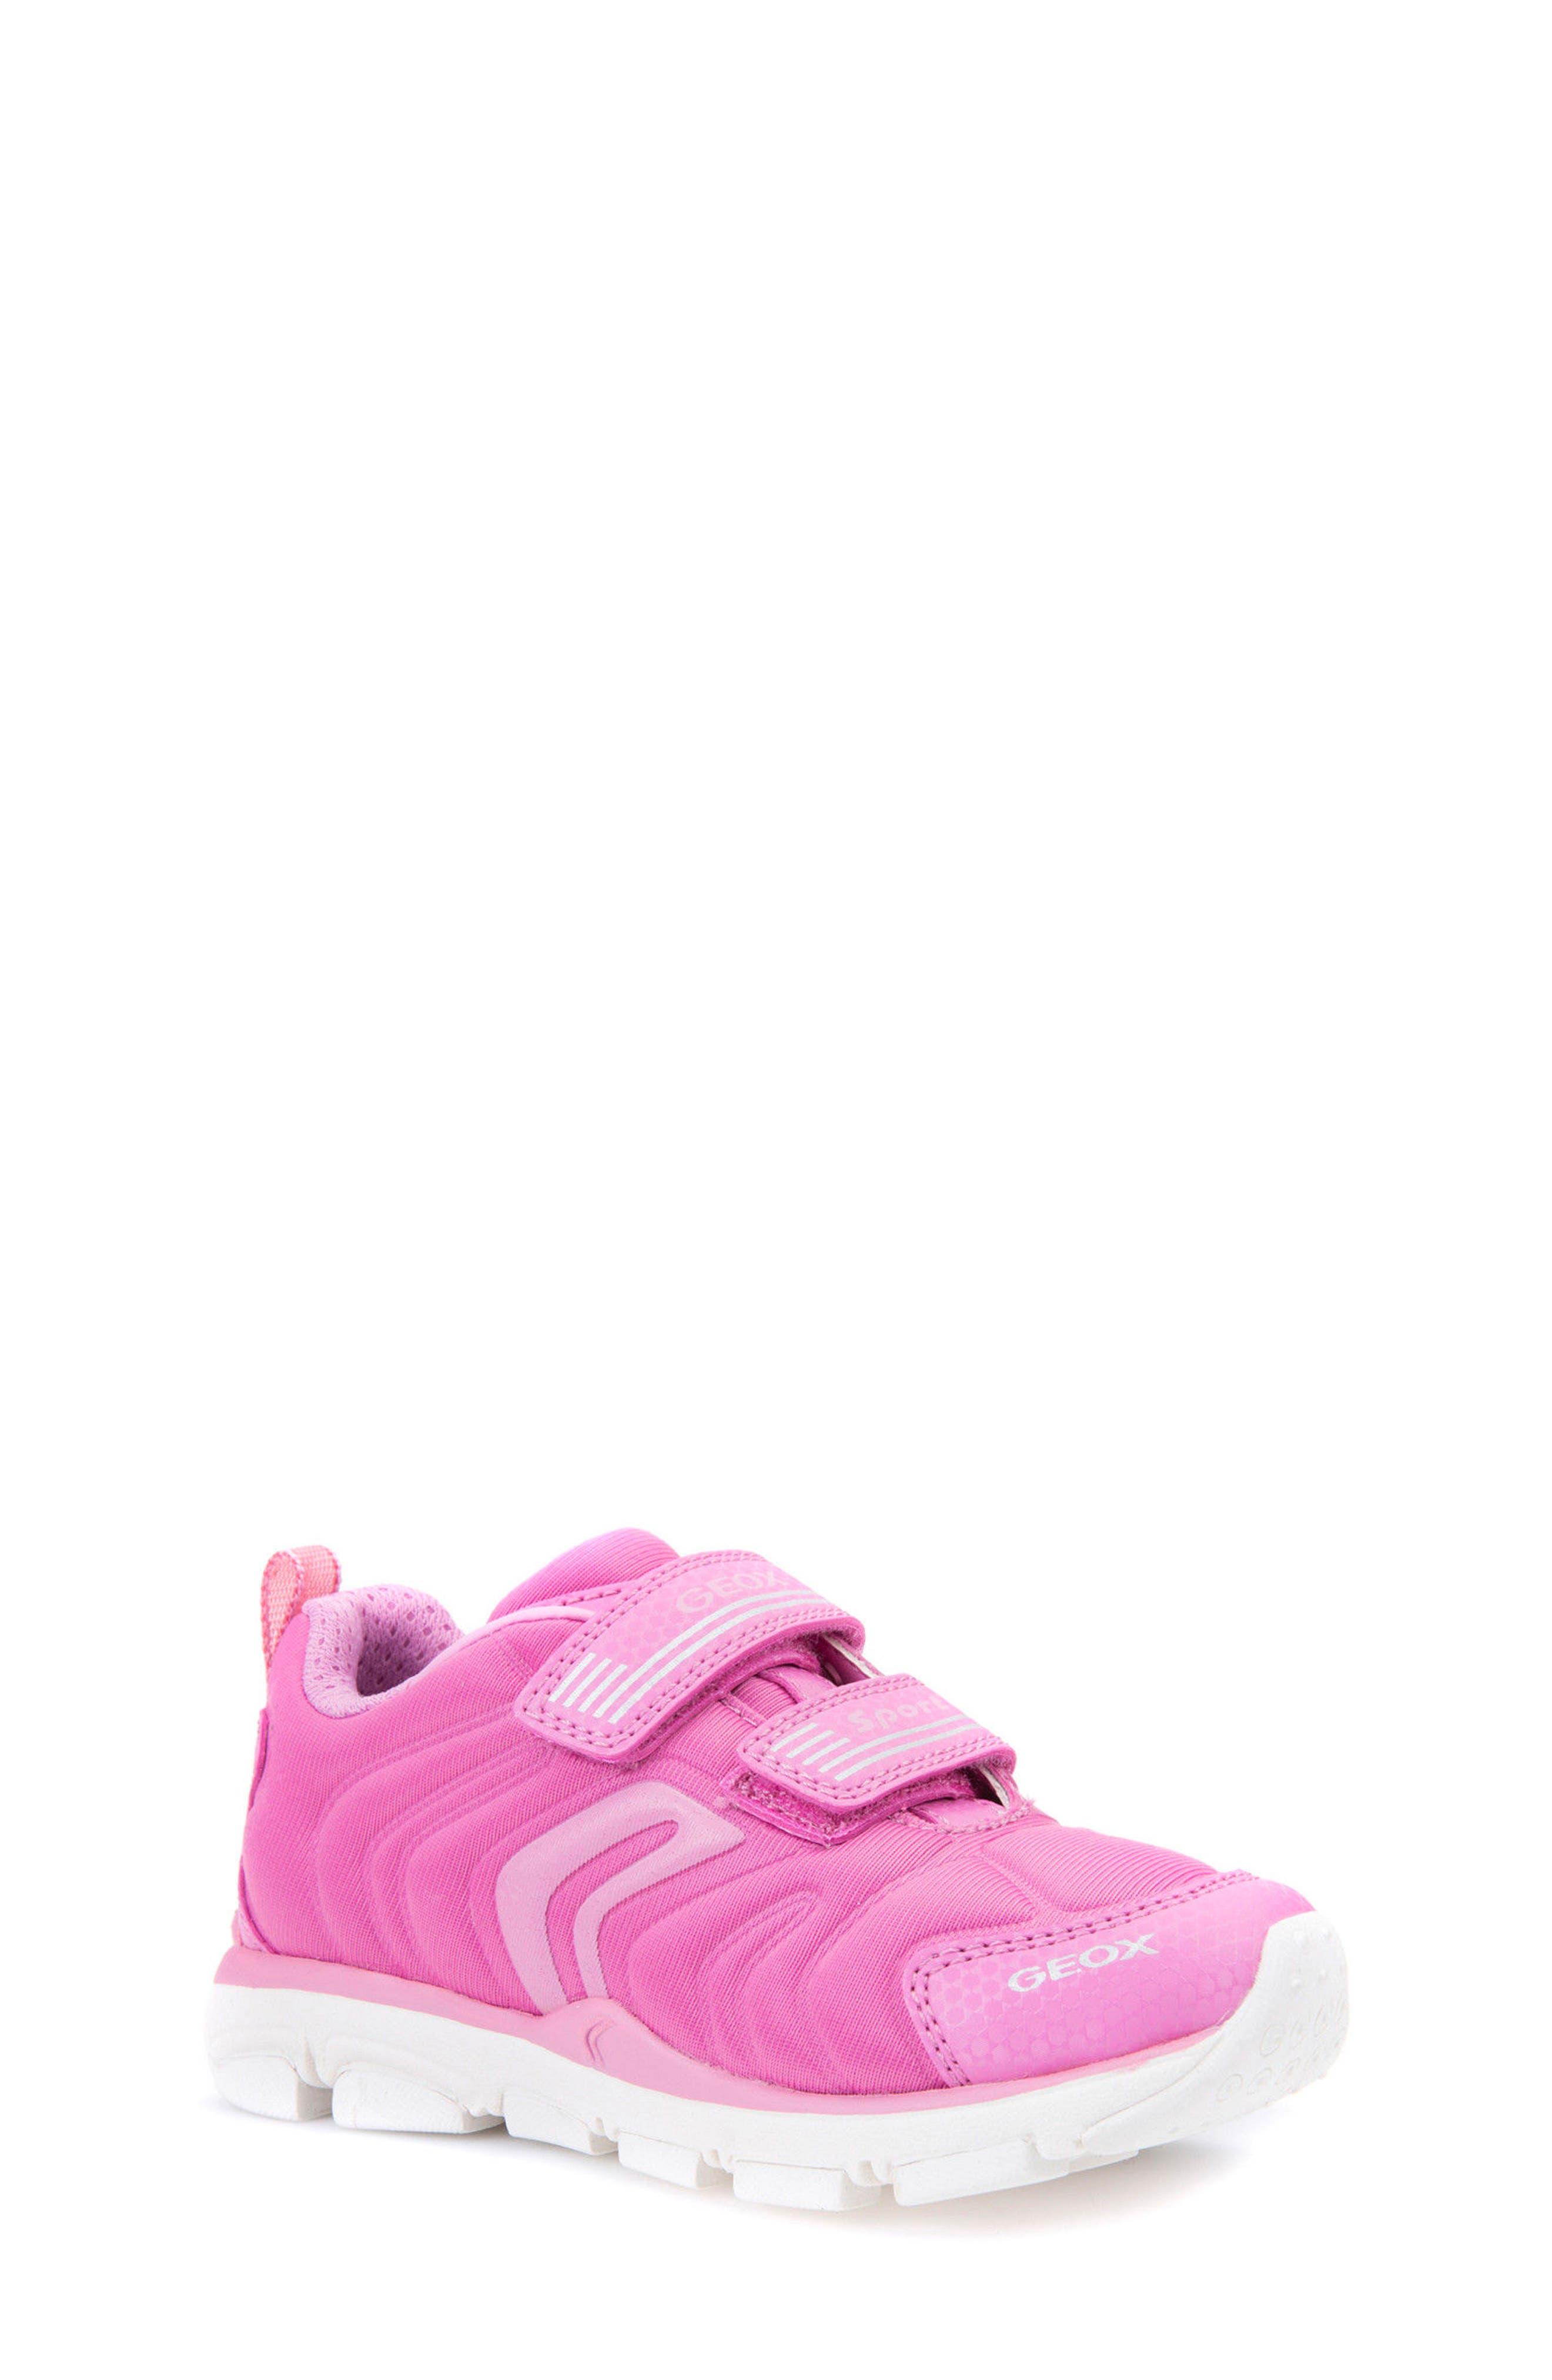 Torque Sneaker,                             Main thumbnail 1, color,                             Fuchsia/ Dark Pink